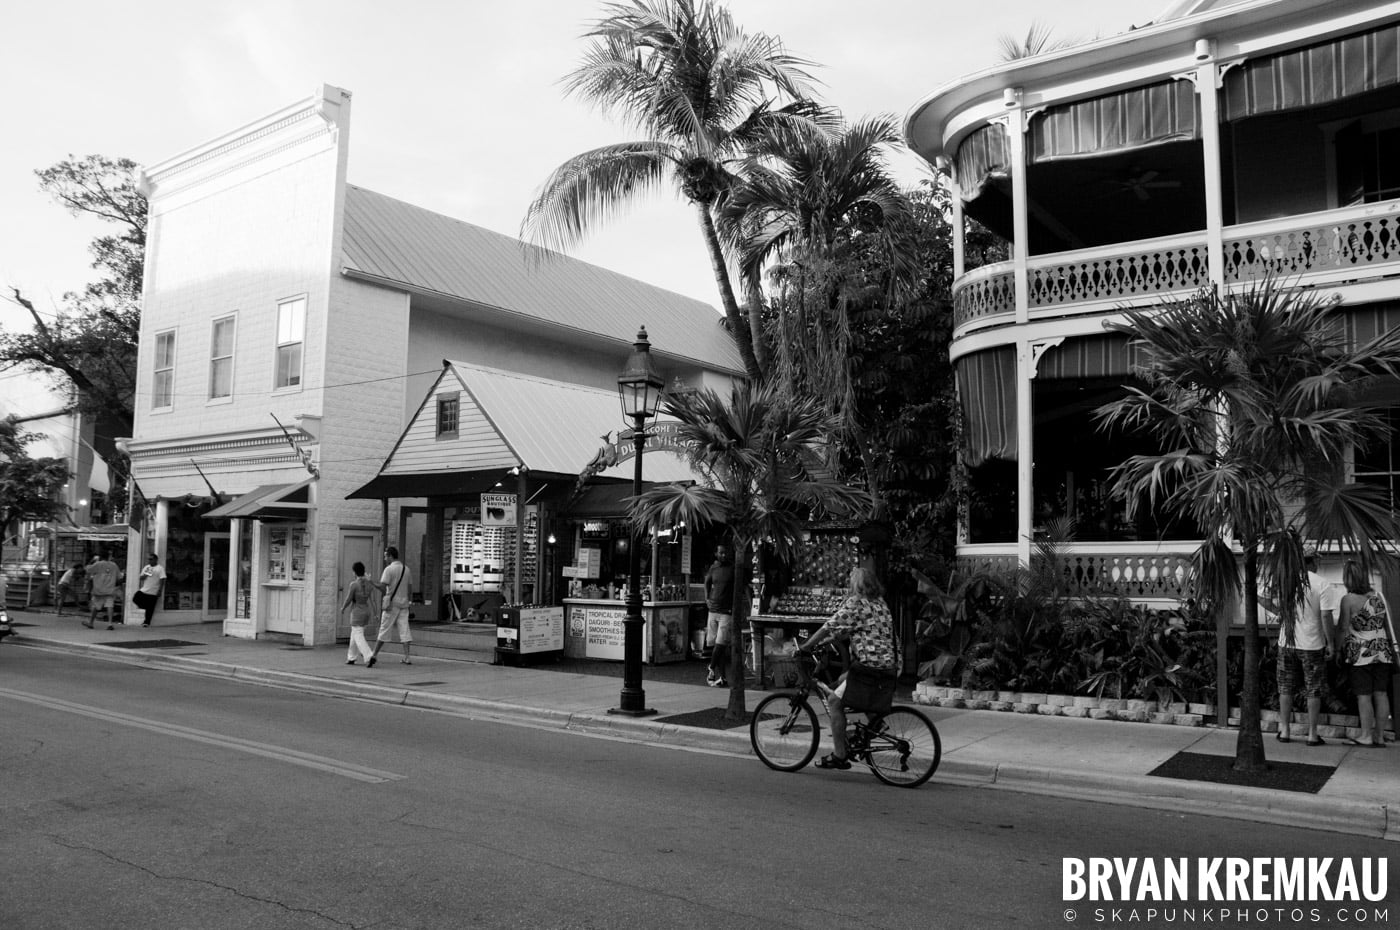 Florida Keys Vacation - 7.09.10 - 7.15.10 (31)